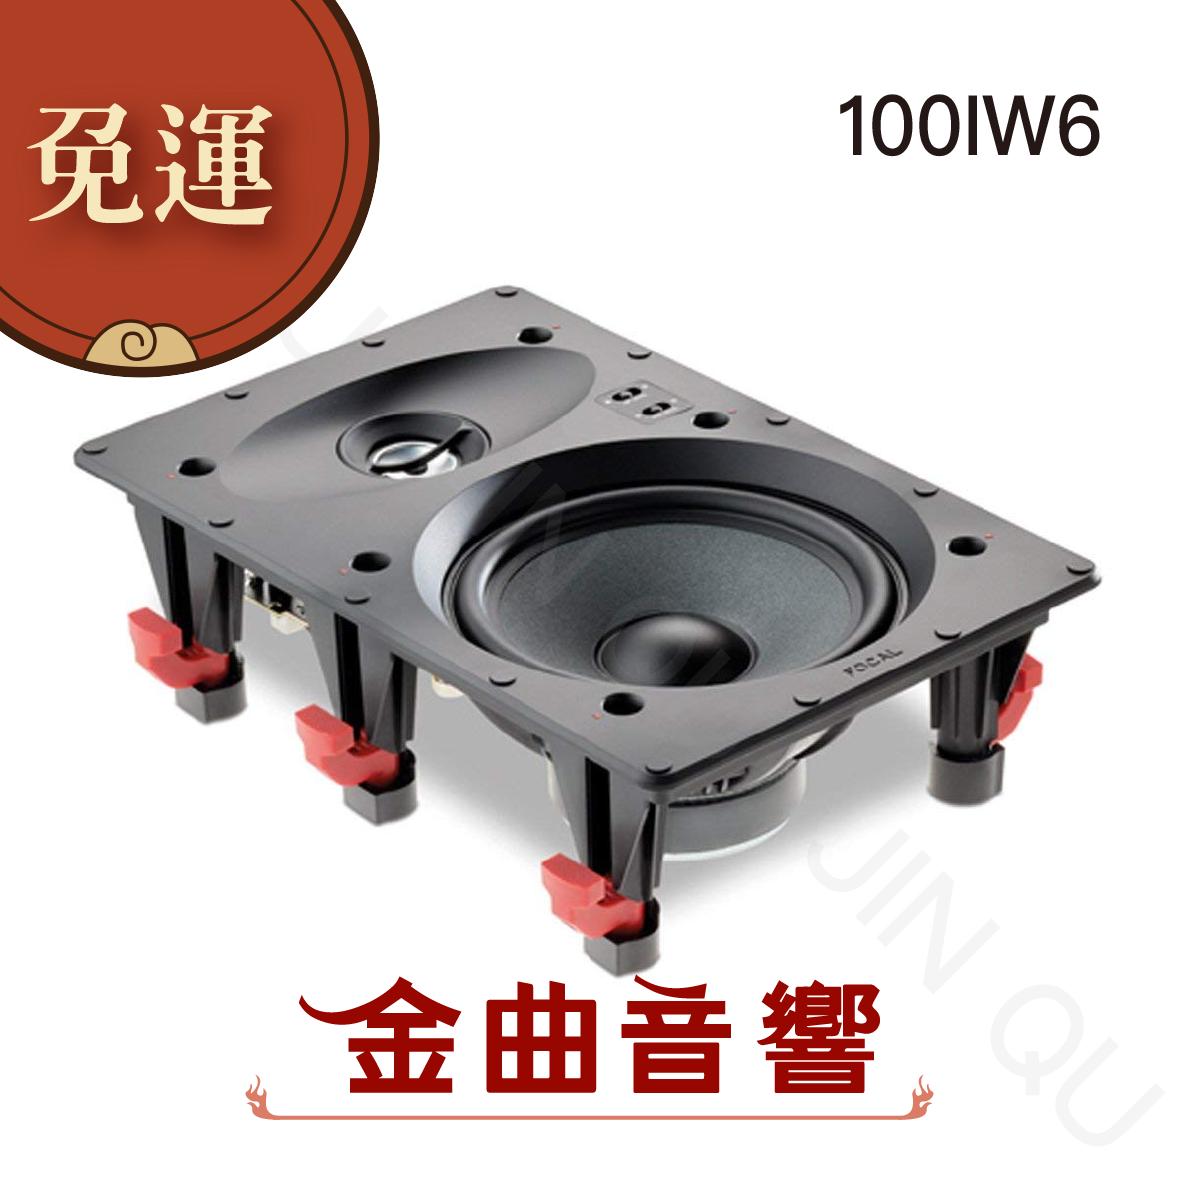 FOCAL Custom 100IW6 嵌入式 揚聲器 喇叭 吸頂 音響 (支) IW 106 後繼款 | 金曲音響